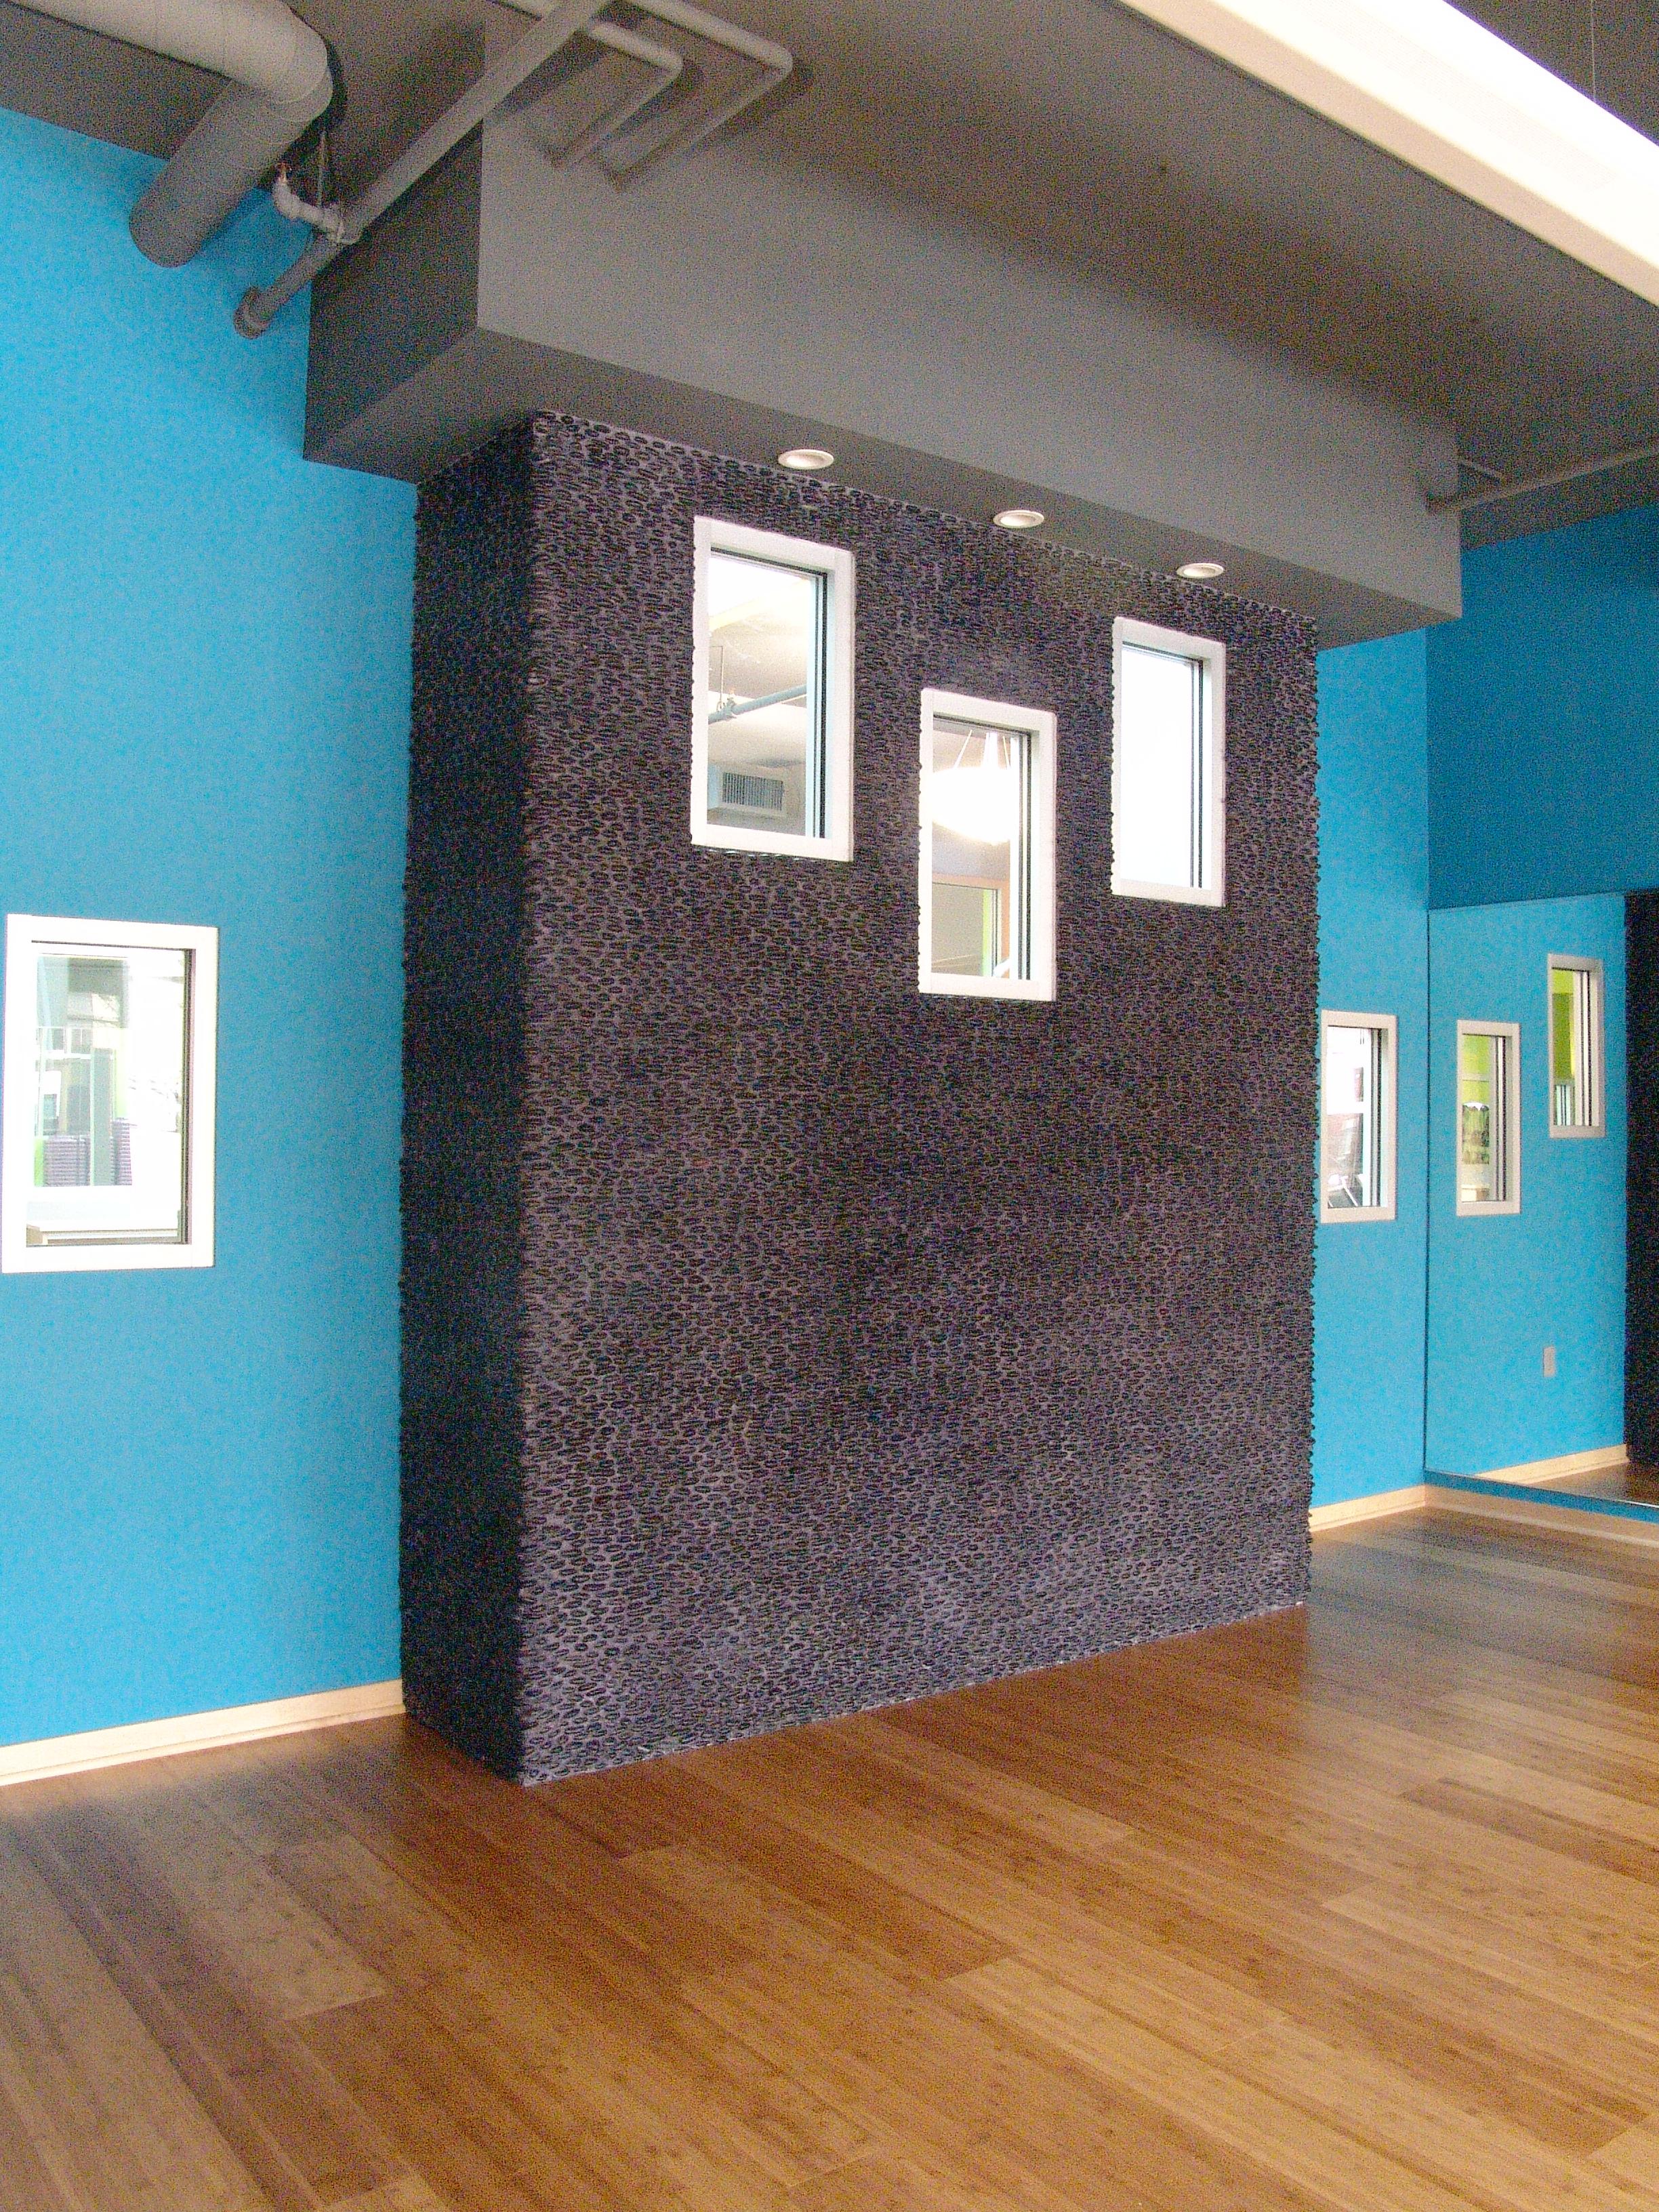 008-stacked pebble wall in yoga room_3912.JPG